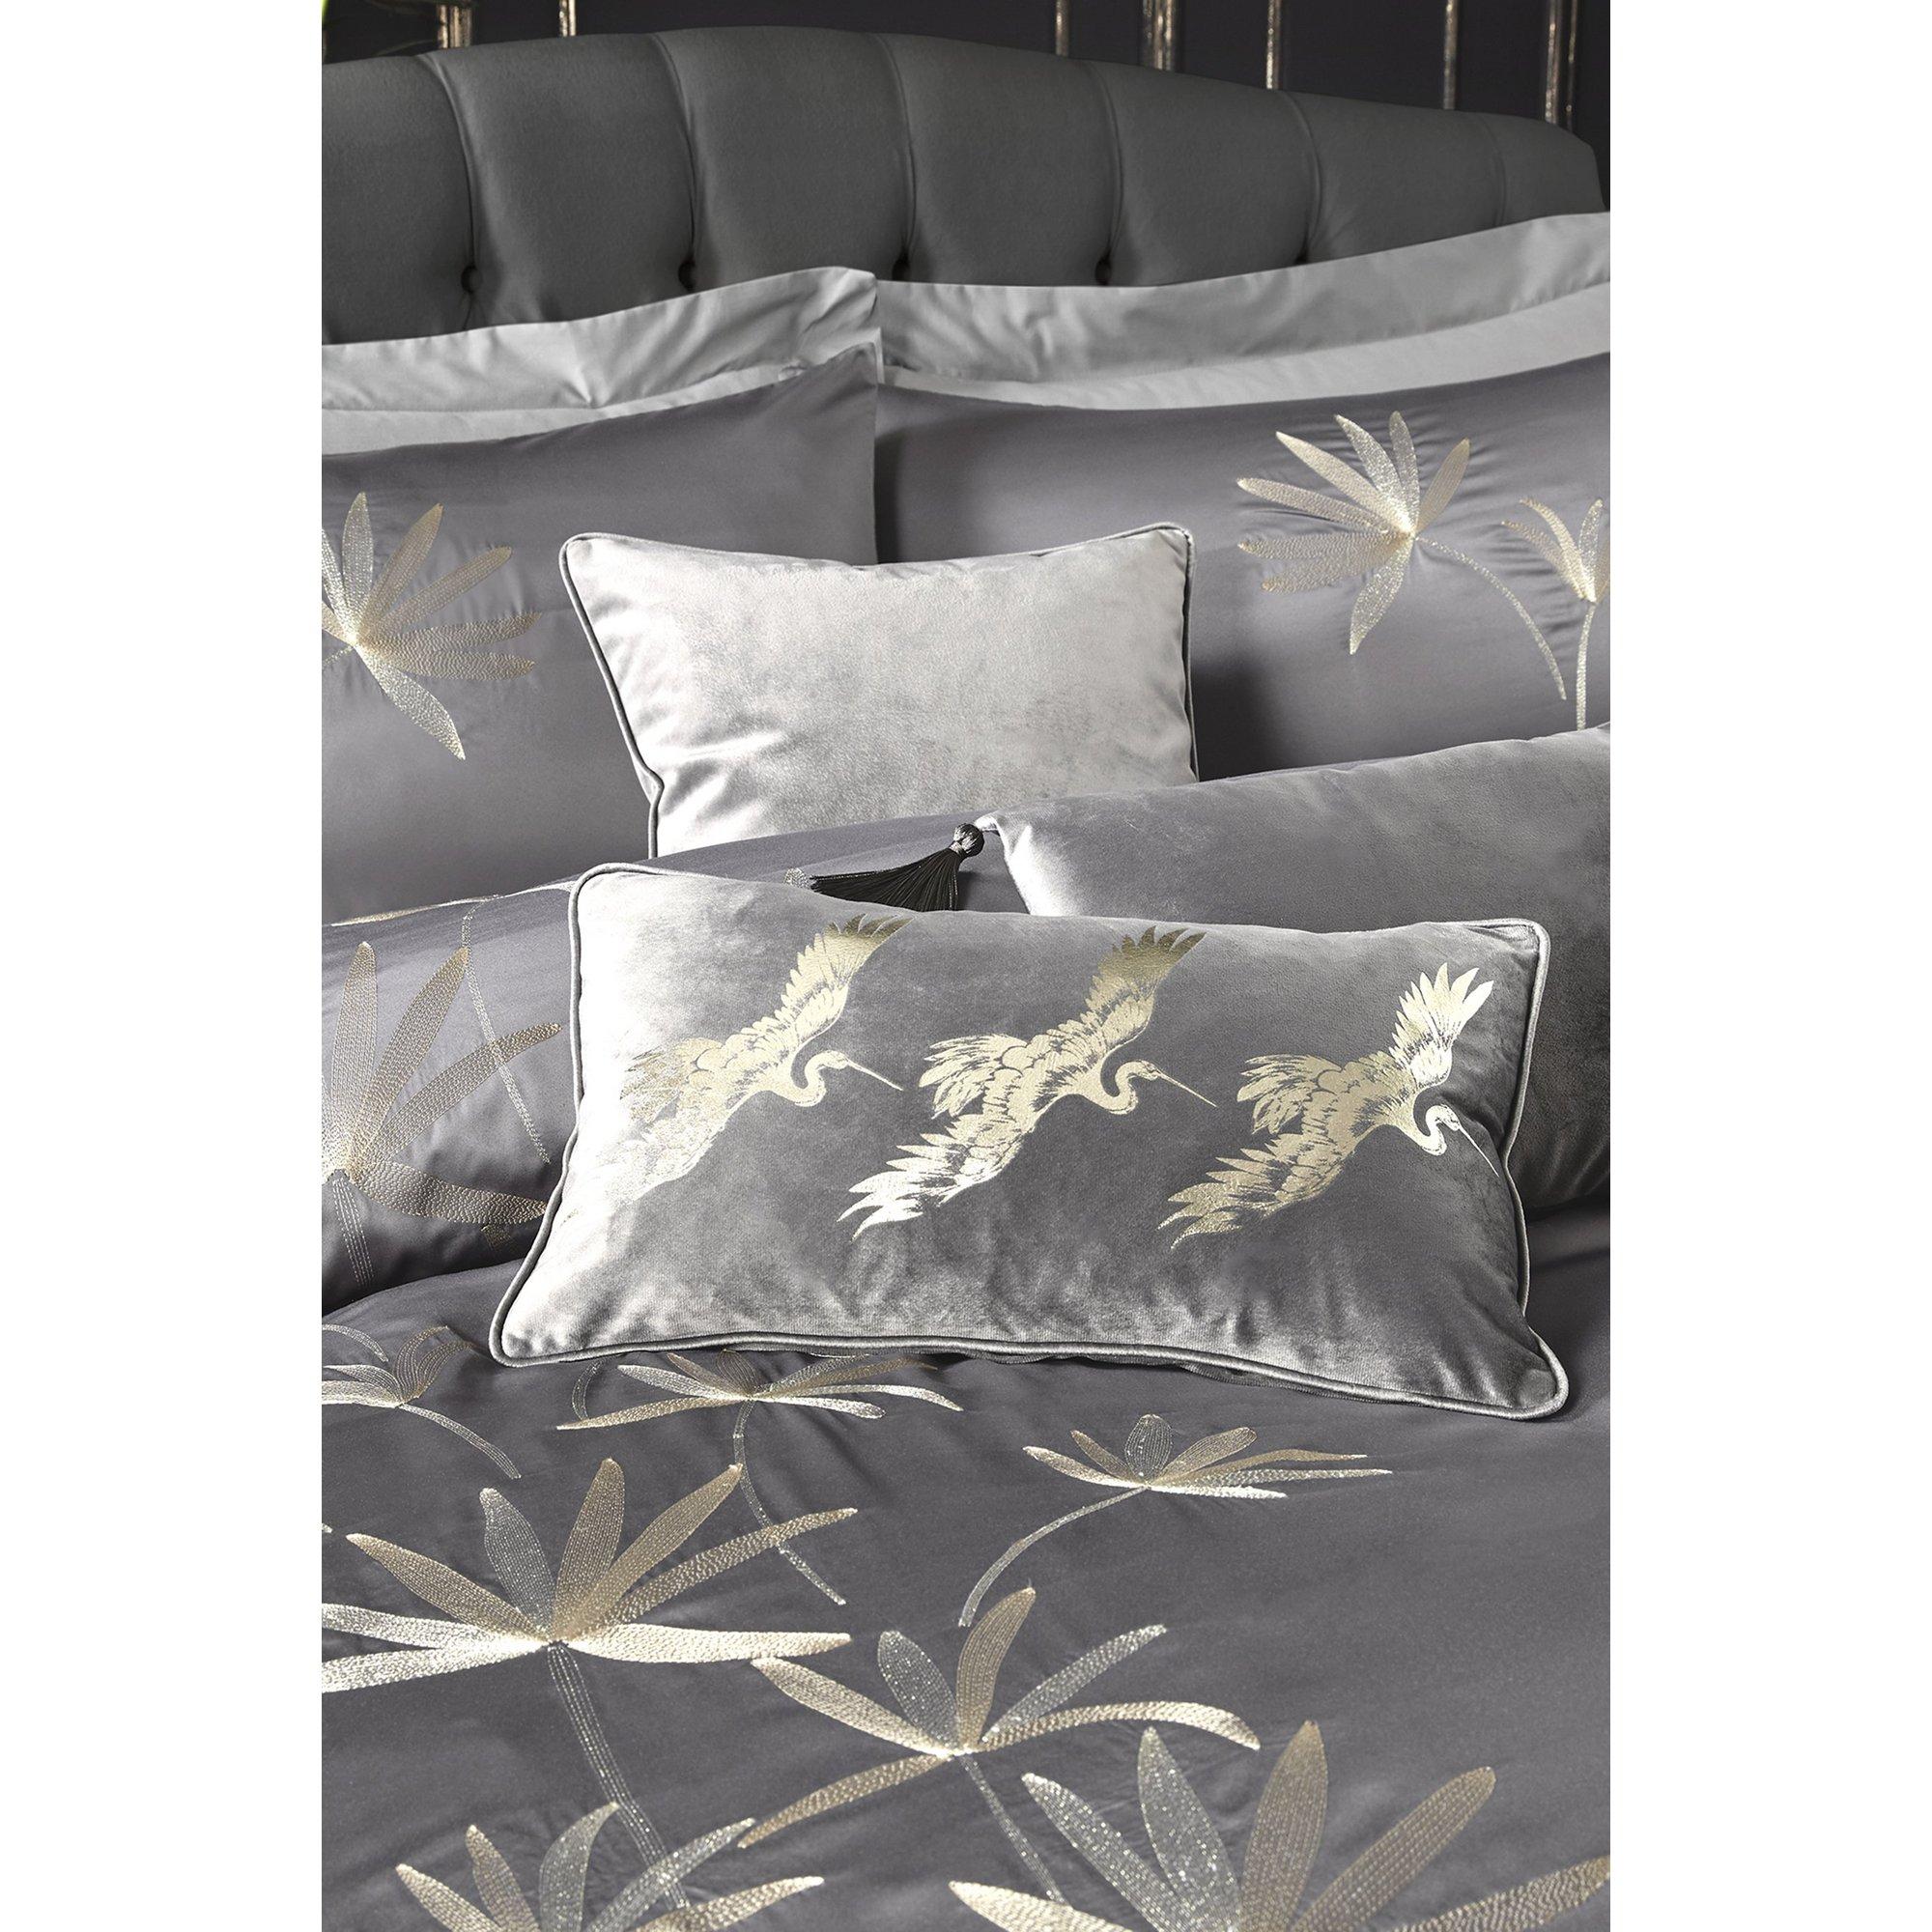 Image of Laurence Llewelyn Bowen Qing Boudoir Cushion